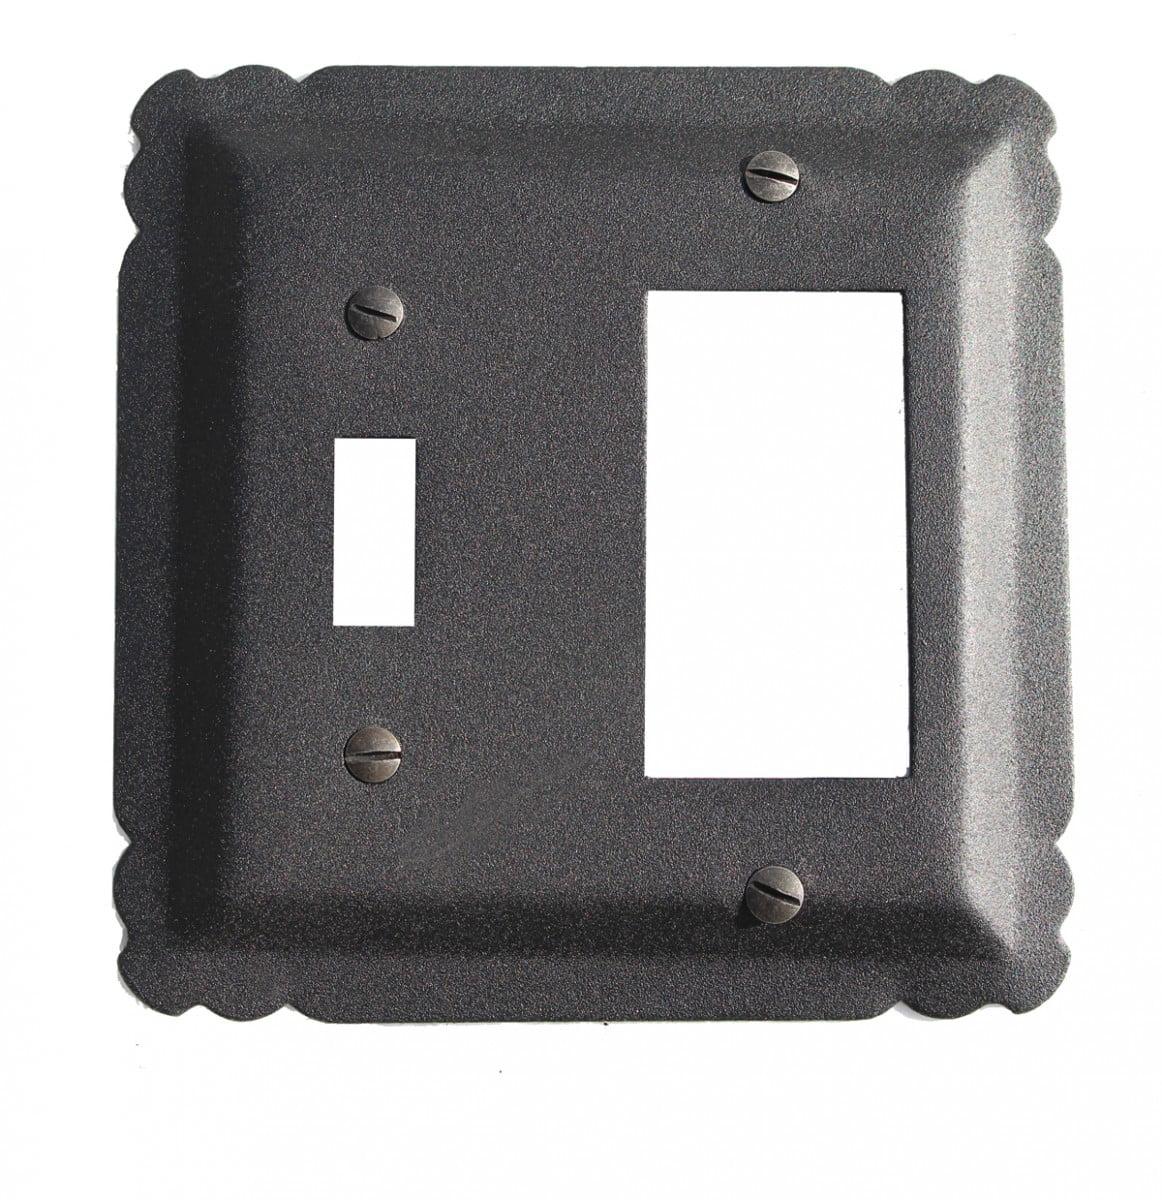 "Switchplate Black Wrought Iron GFI/Toggle 5 1/4"" | Renovator's Supply"